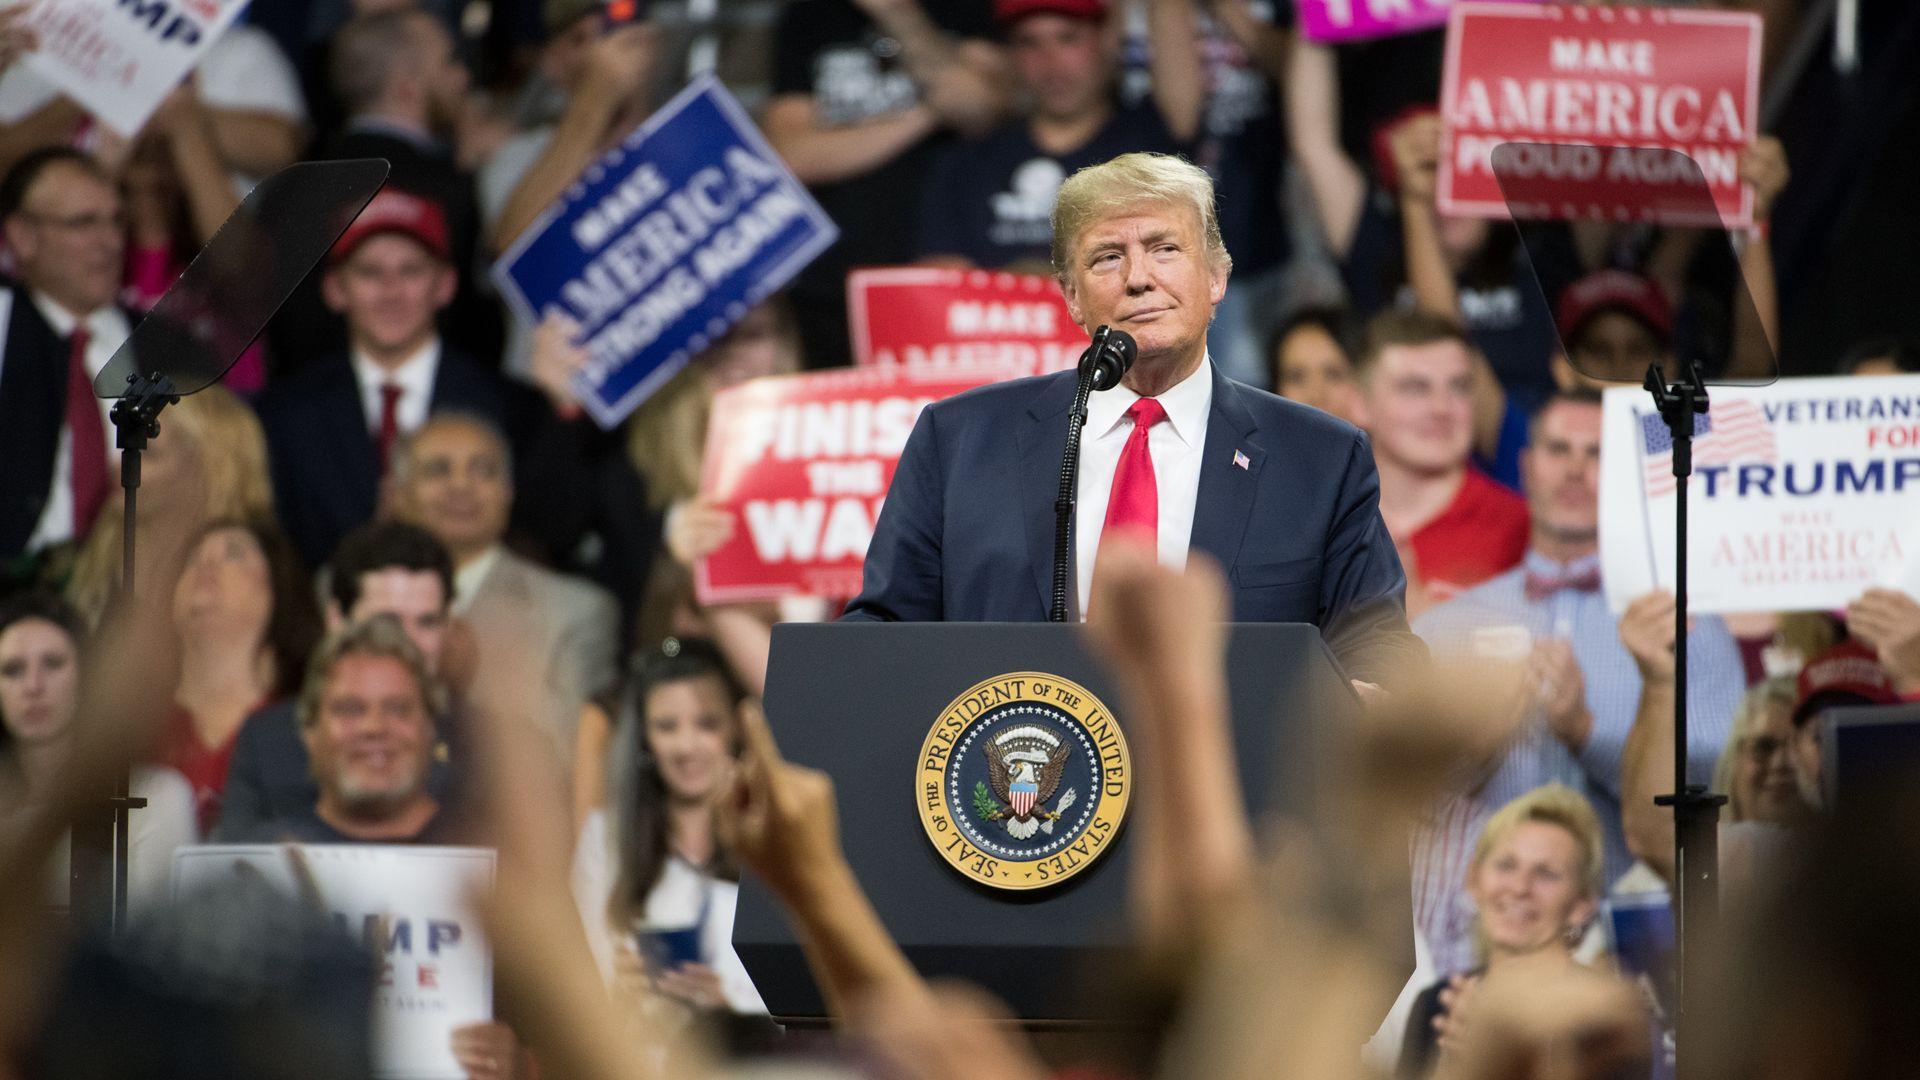 Donald Trump at a rally, smiling.